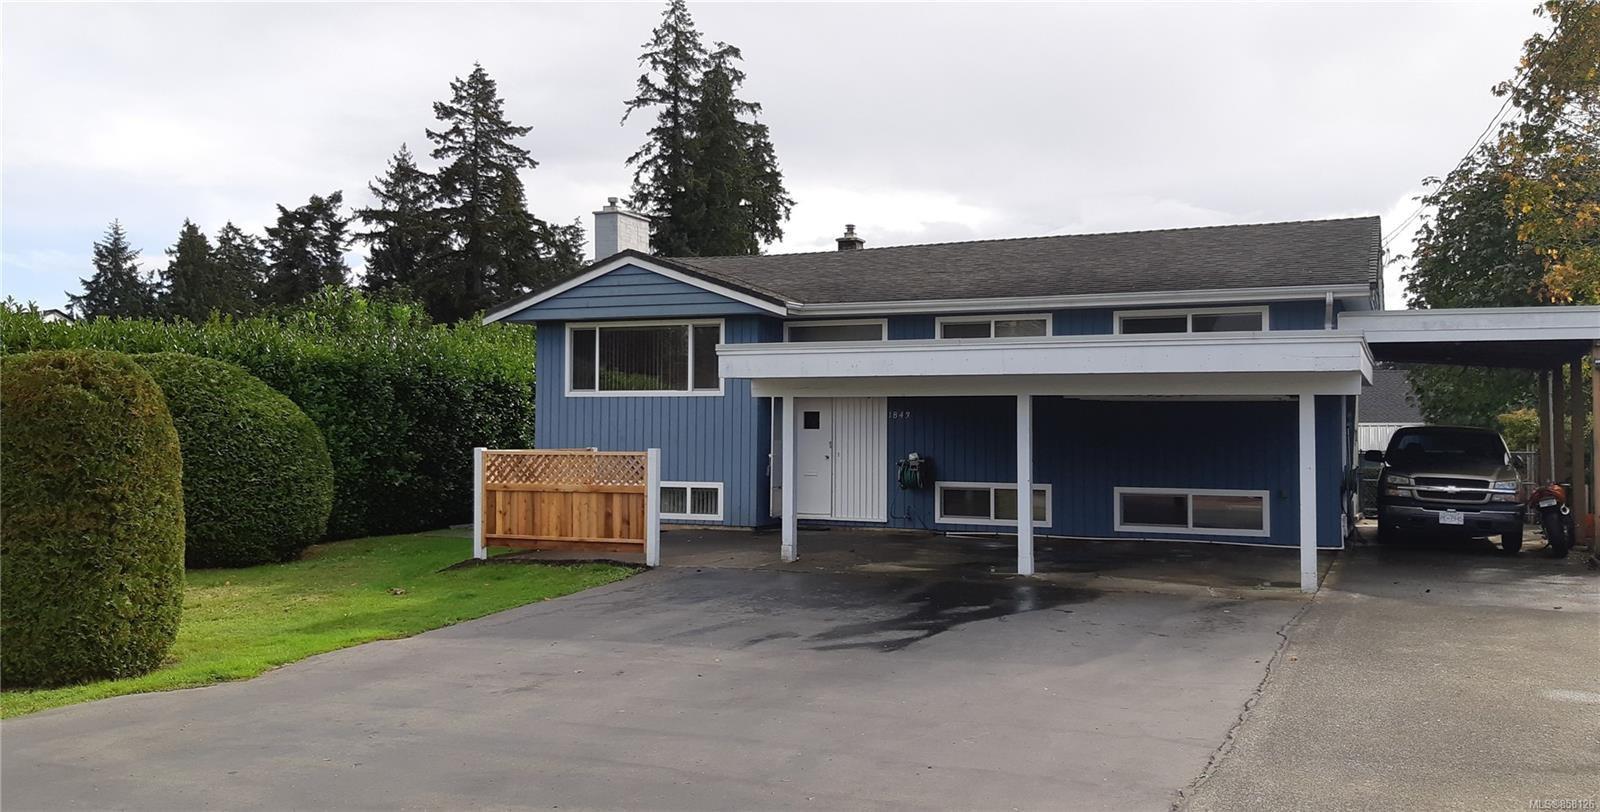 Main Photo: 1843 Centennial Ave in : CV Comox (Town of) House for sale (Comox Valley)  : MLS®# 858126